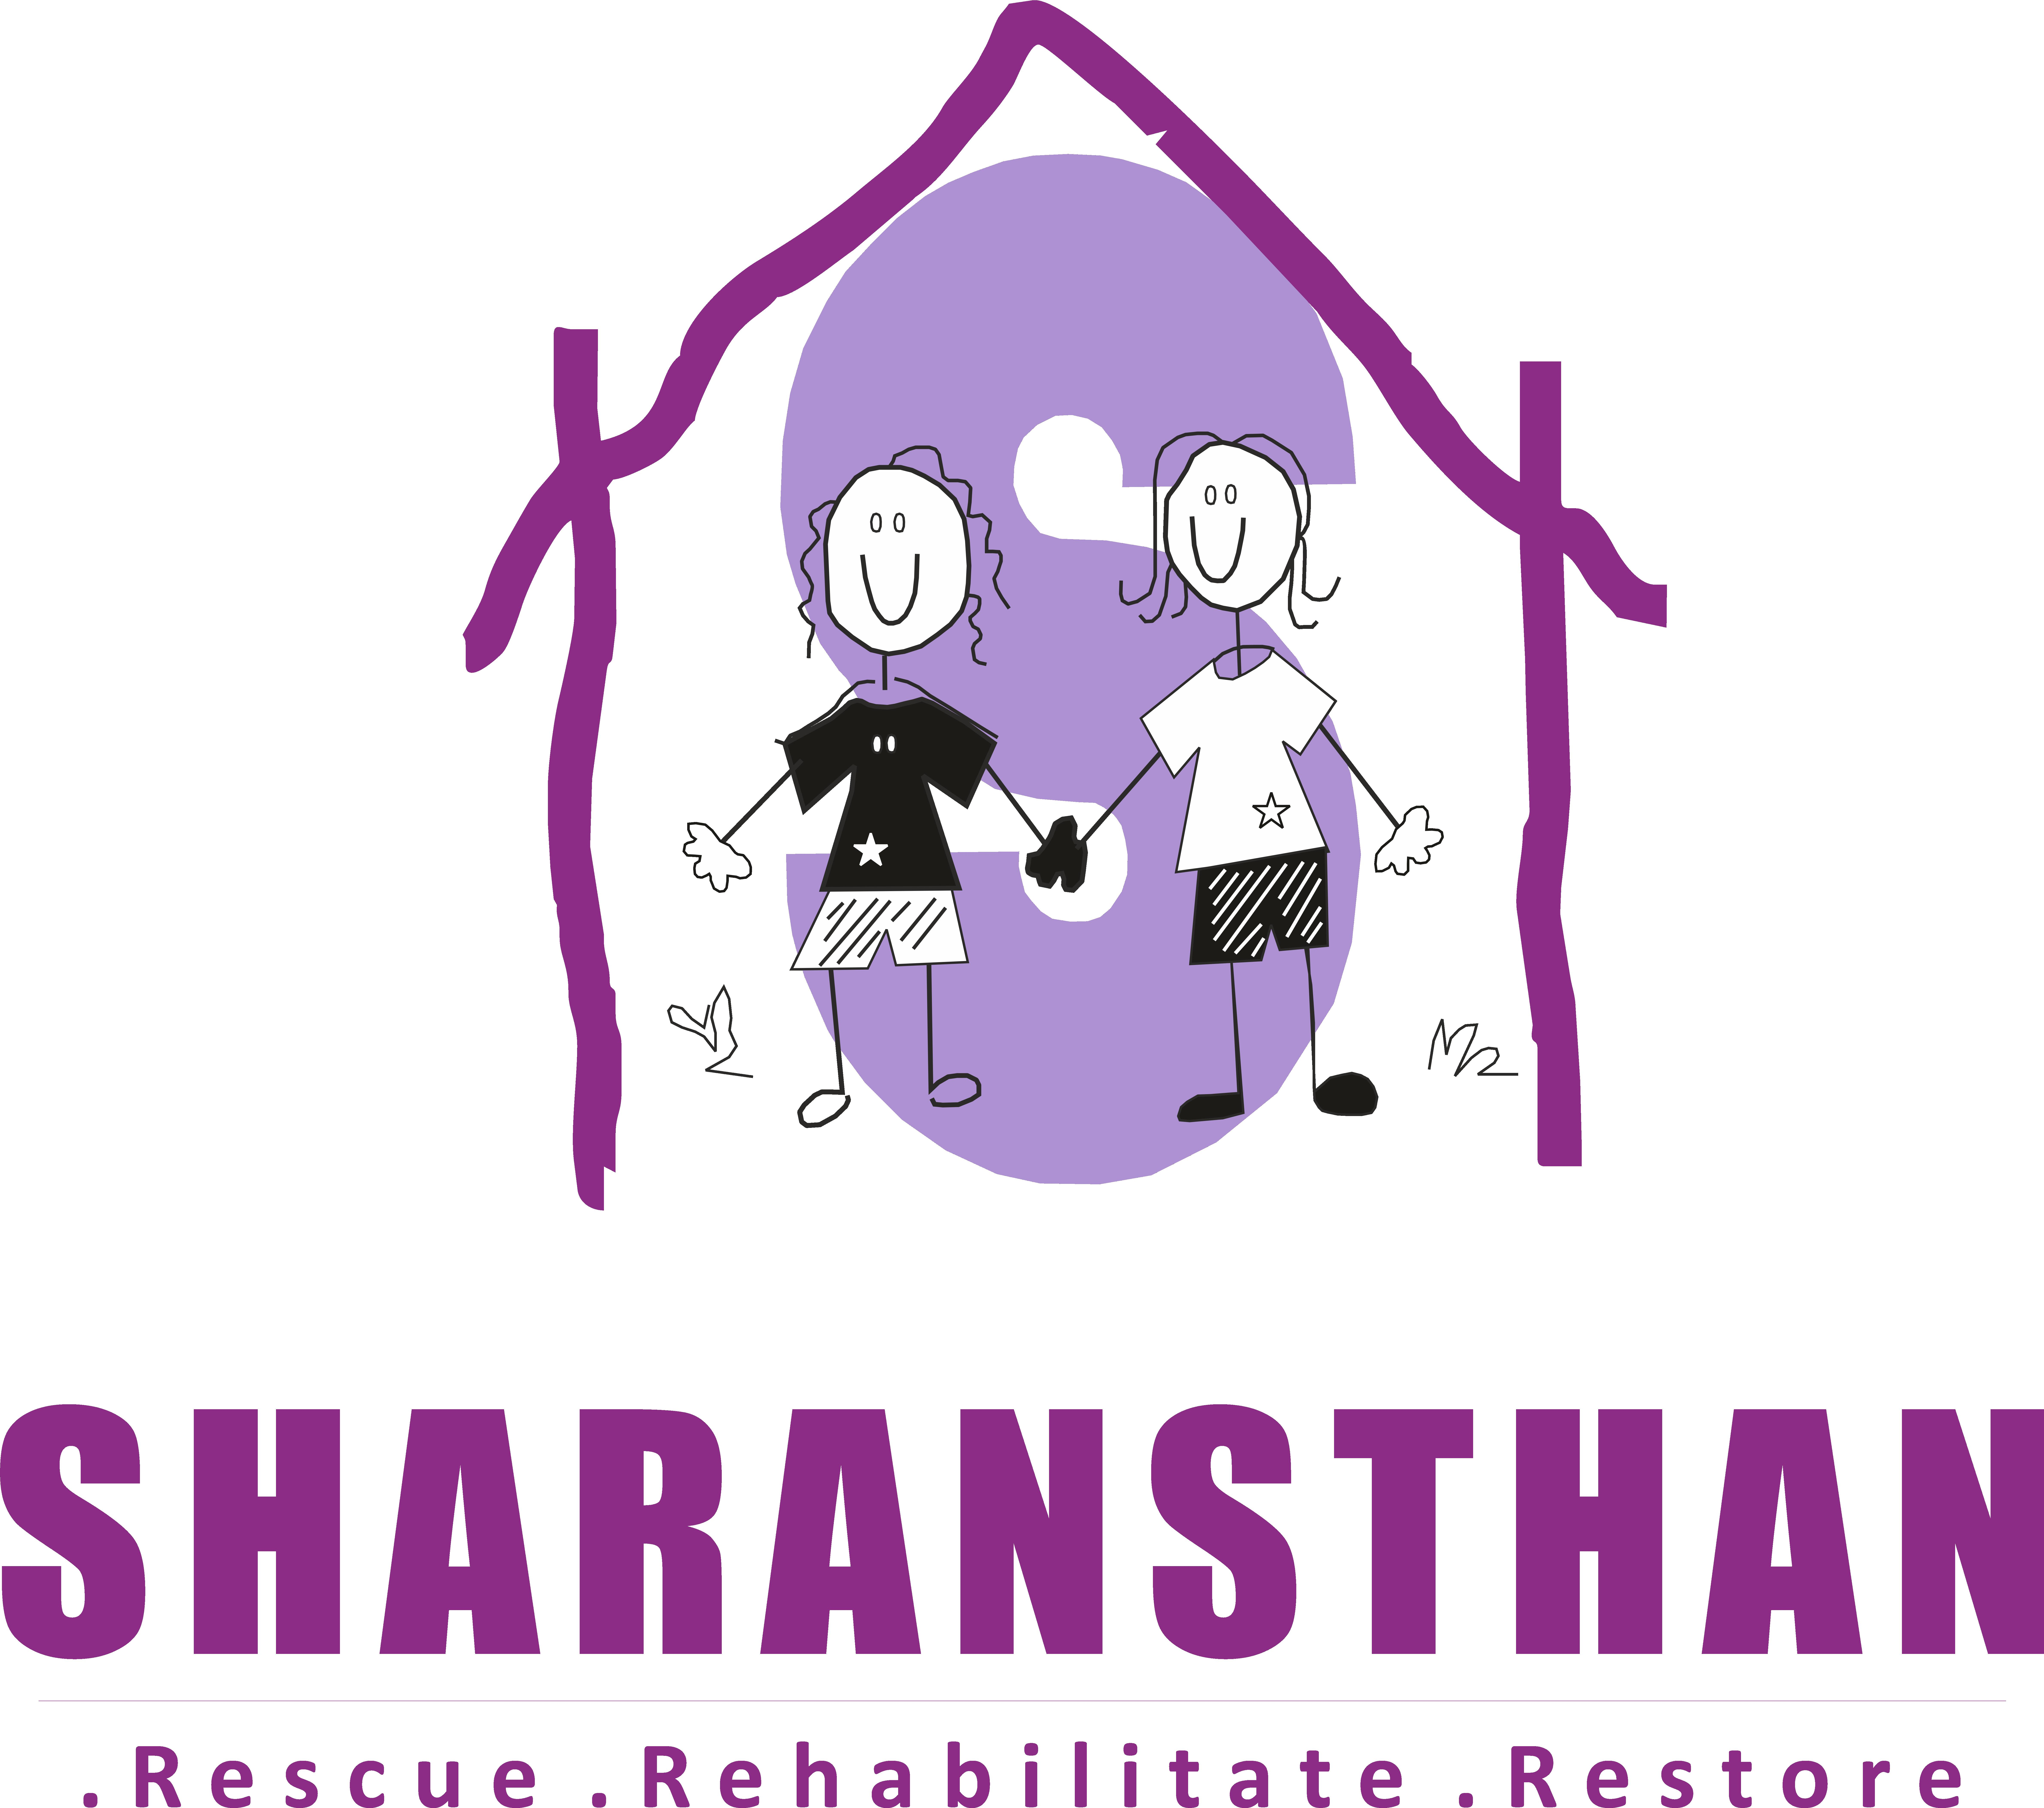 Sharansthan